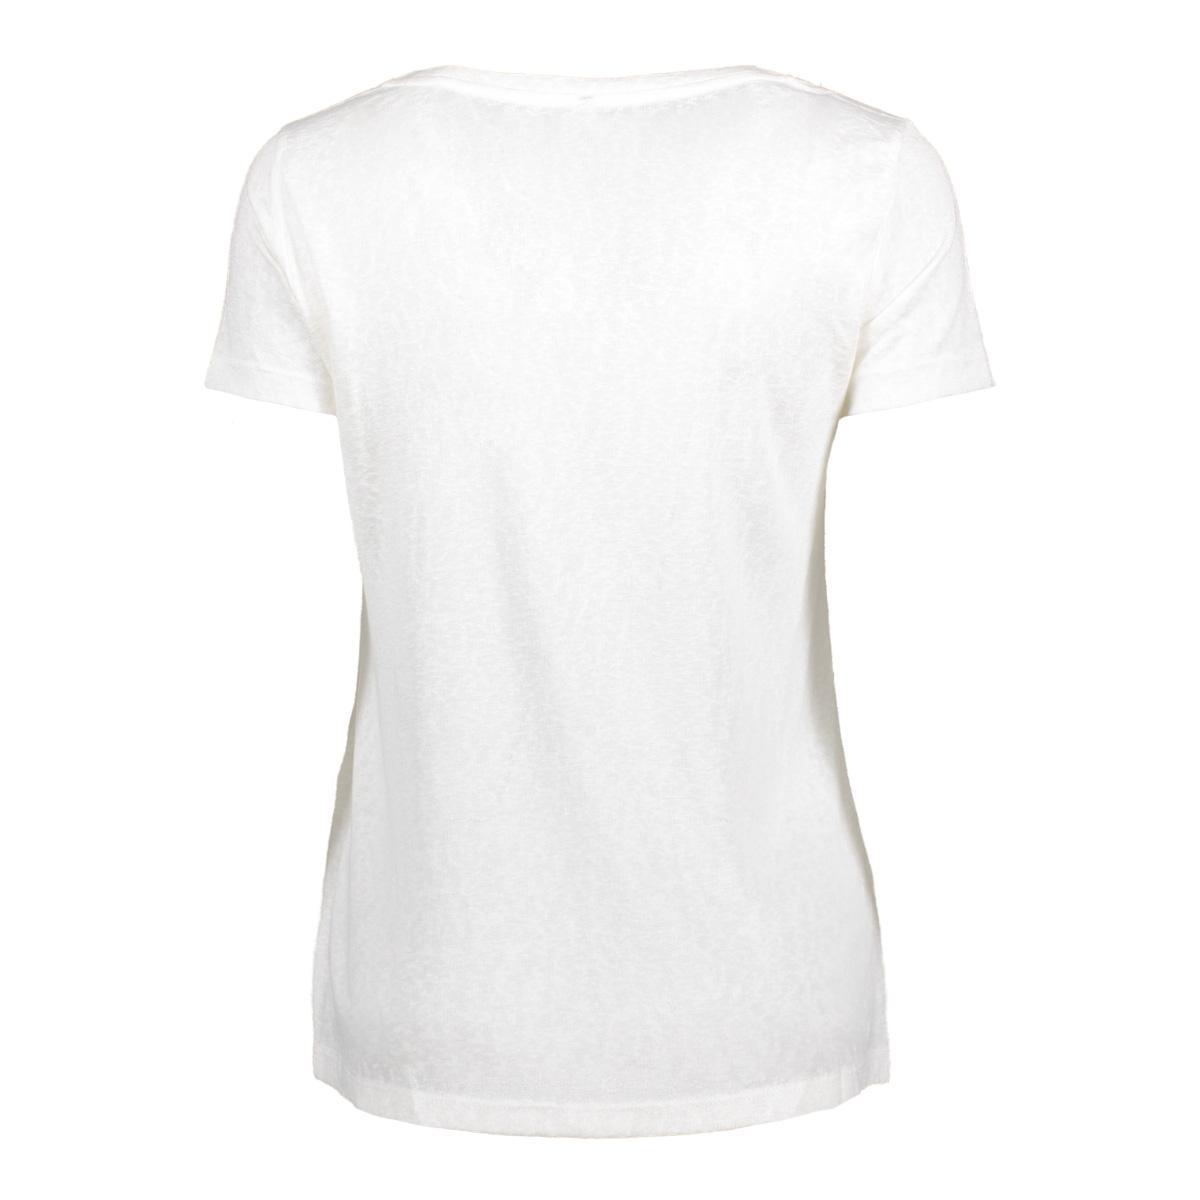 onlpiper s/s unplugged/life top box 15135723 only t-shirt cloud dancer/ life